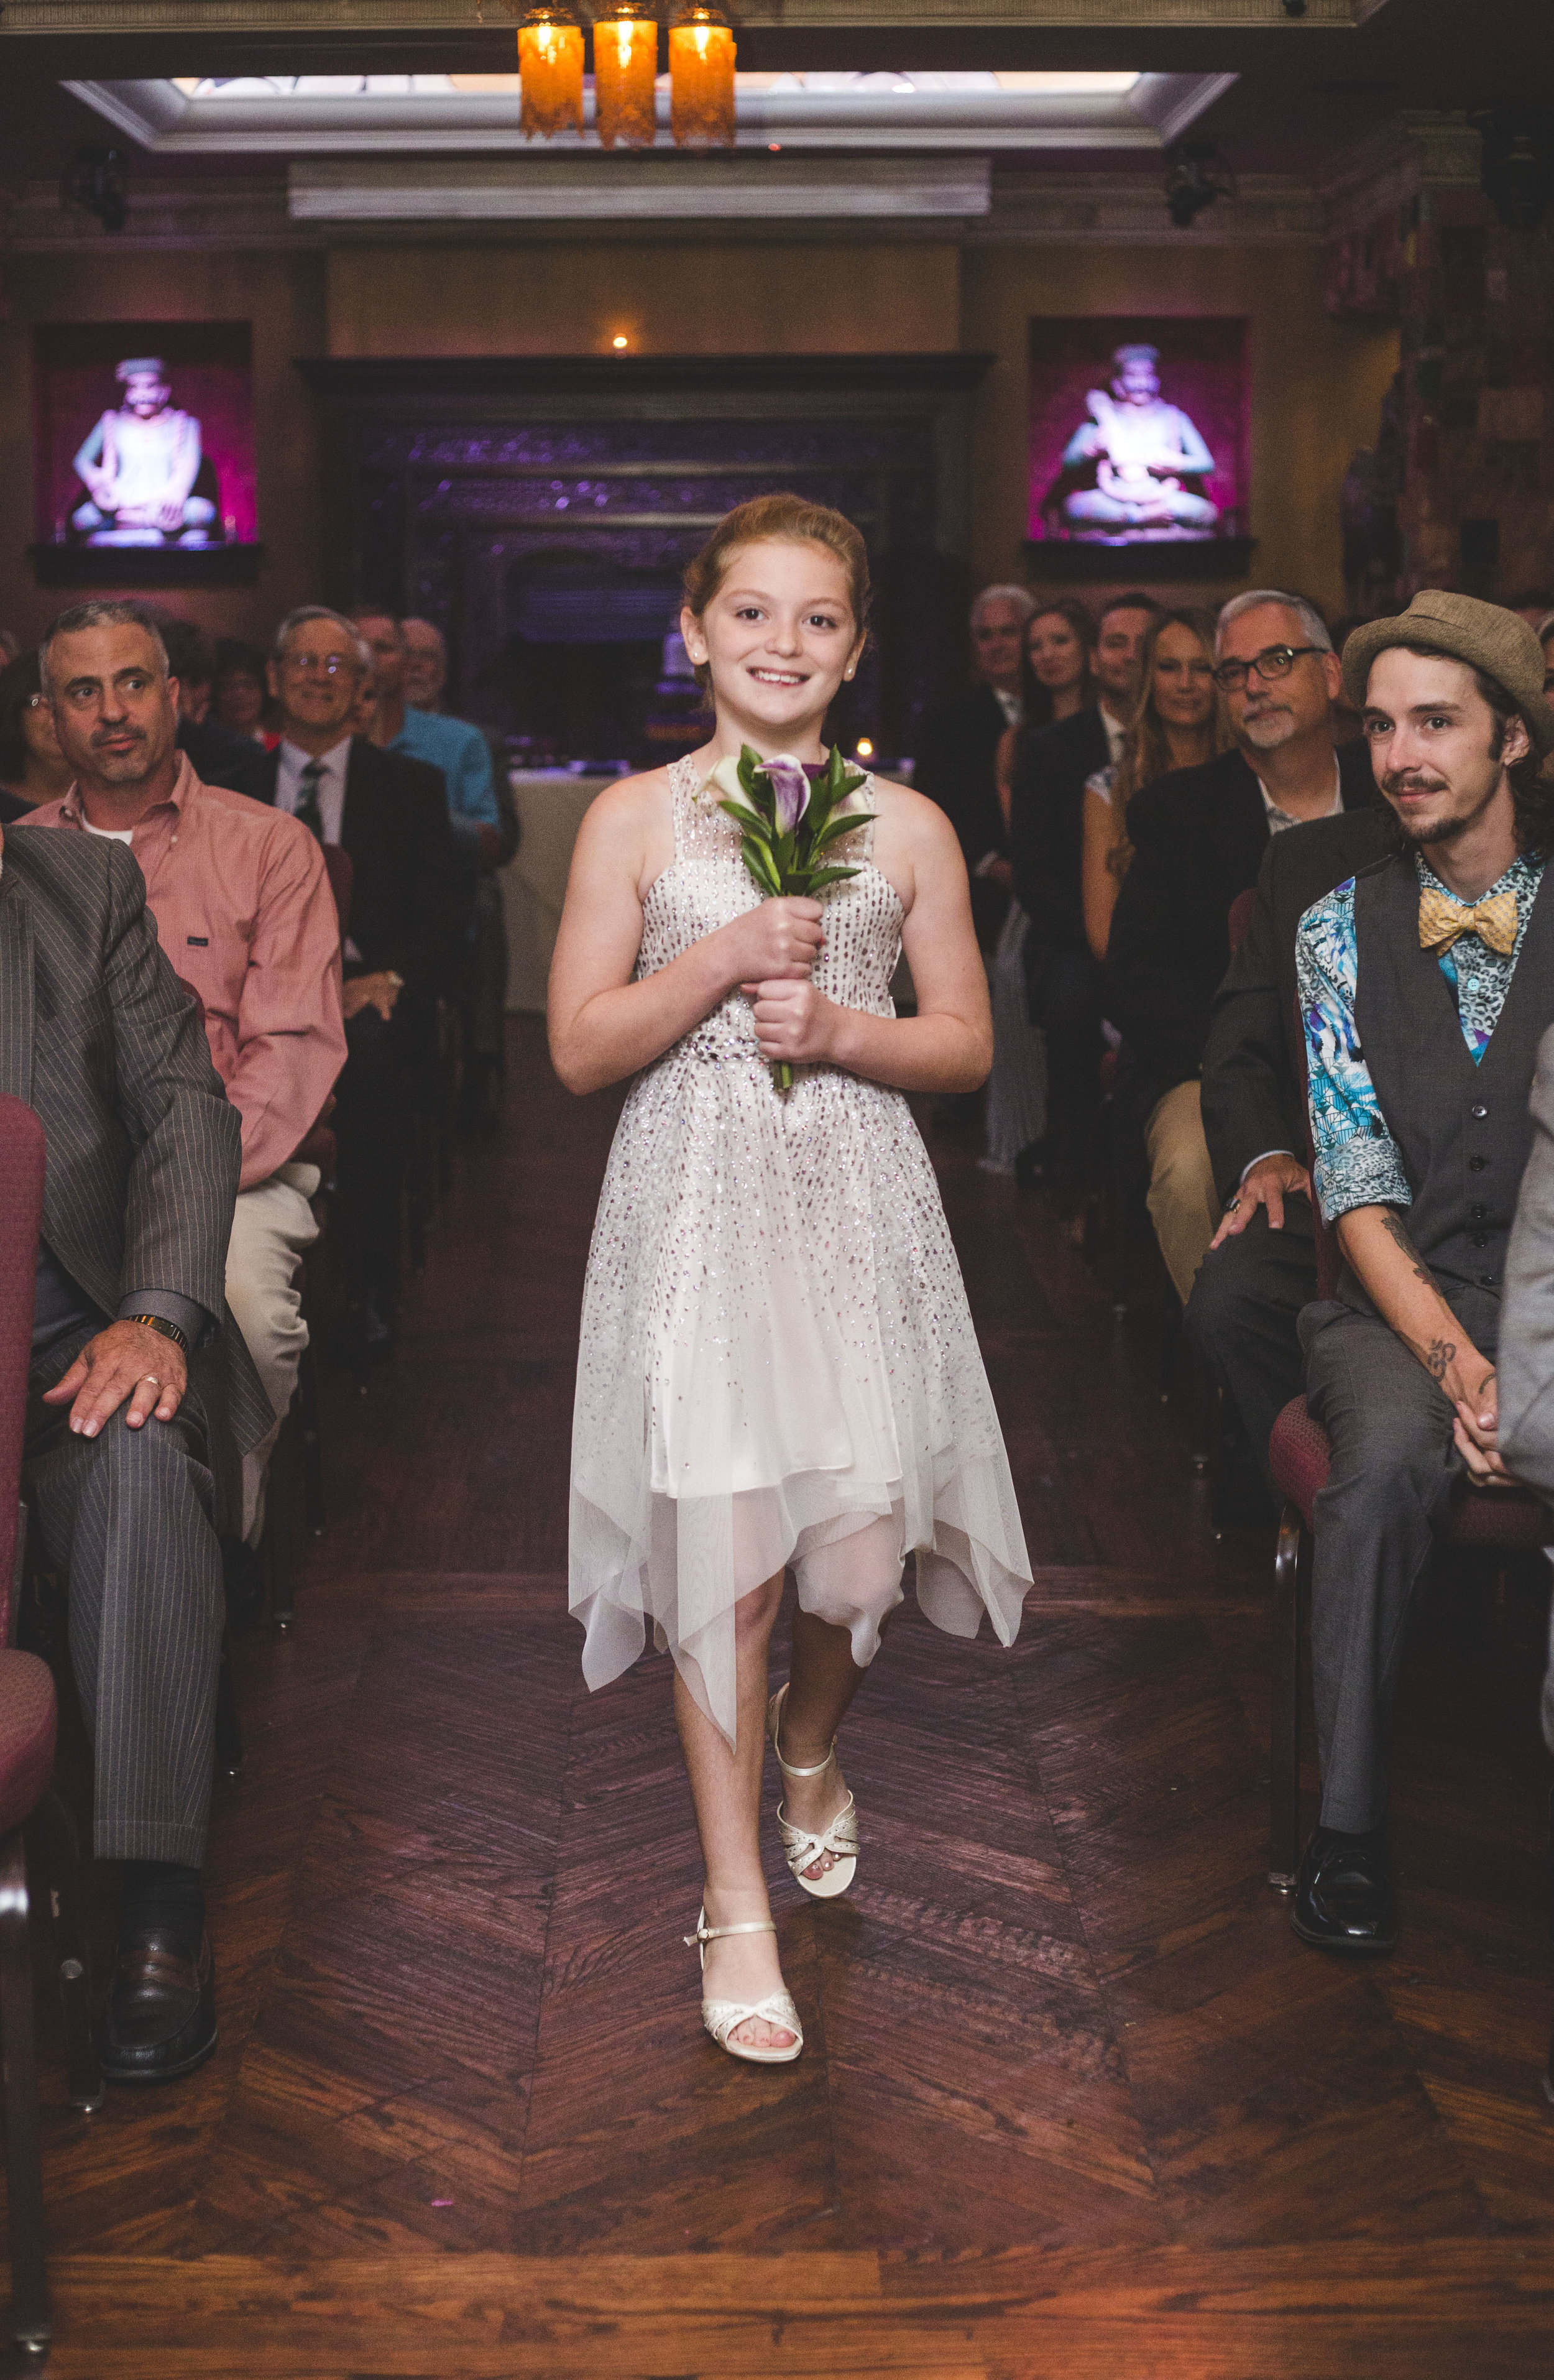 ATGI_Kat and Gabe Wedding 2016_2S8A5273.jpg